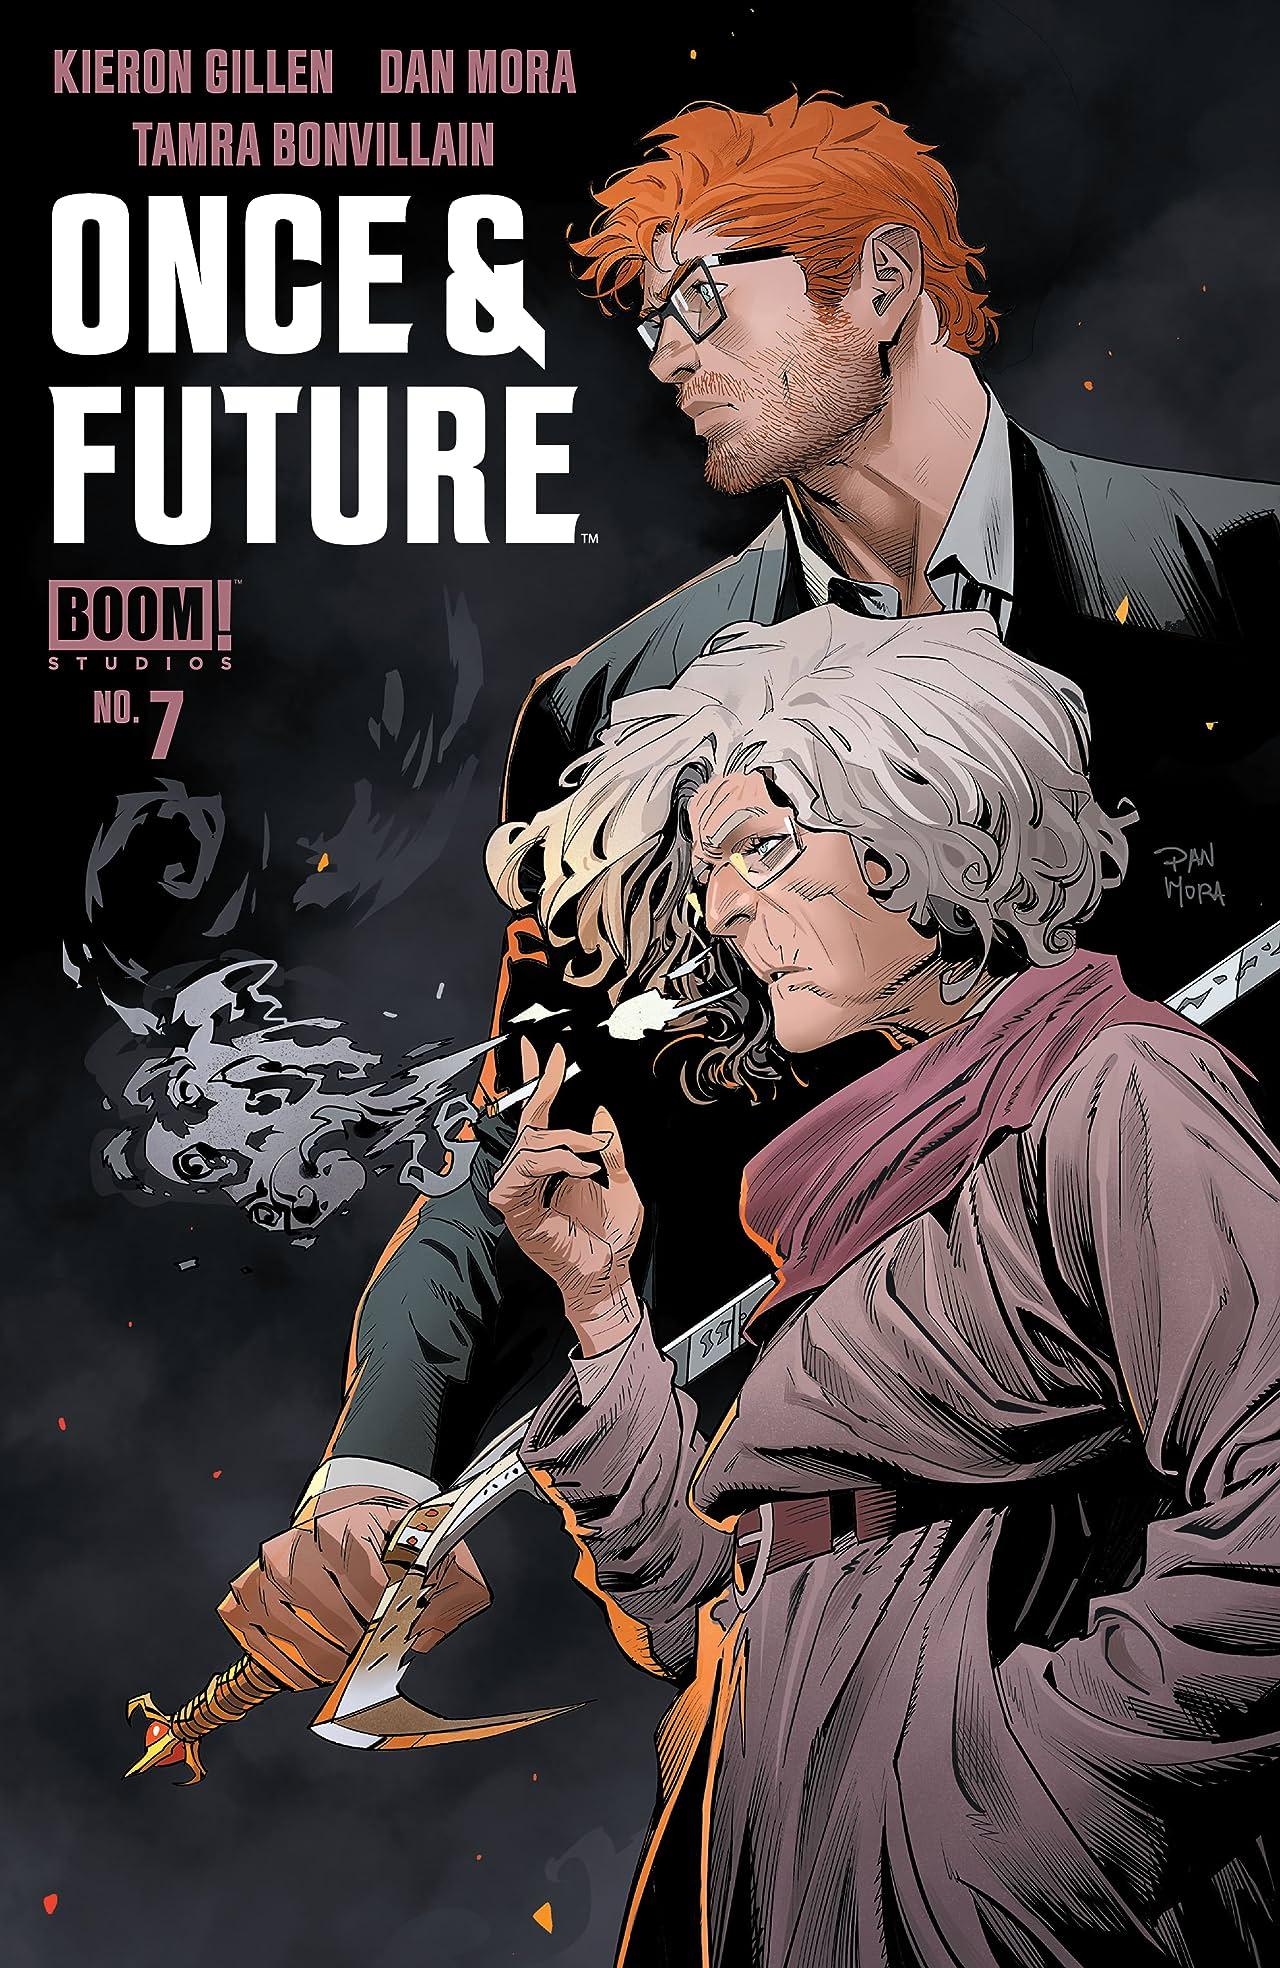 Once & Future No.7